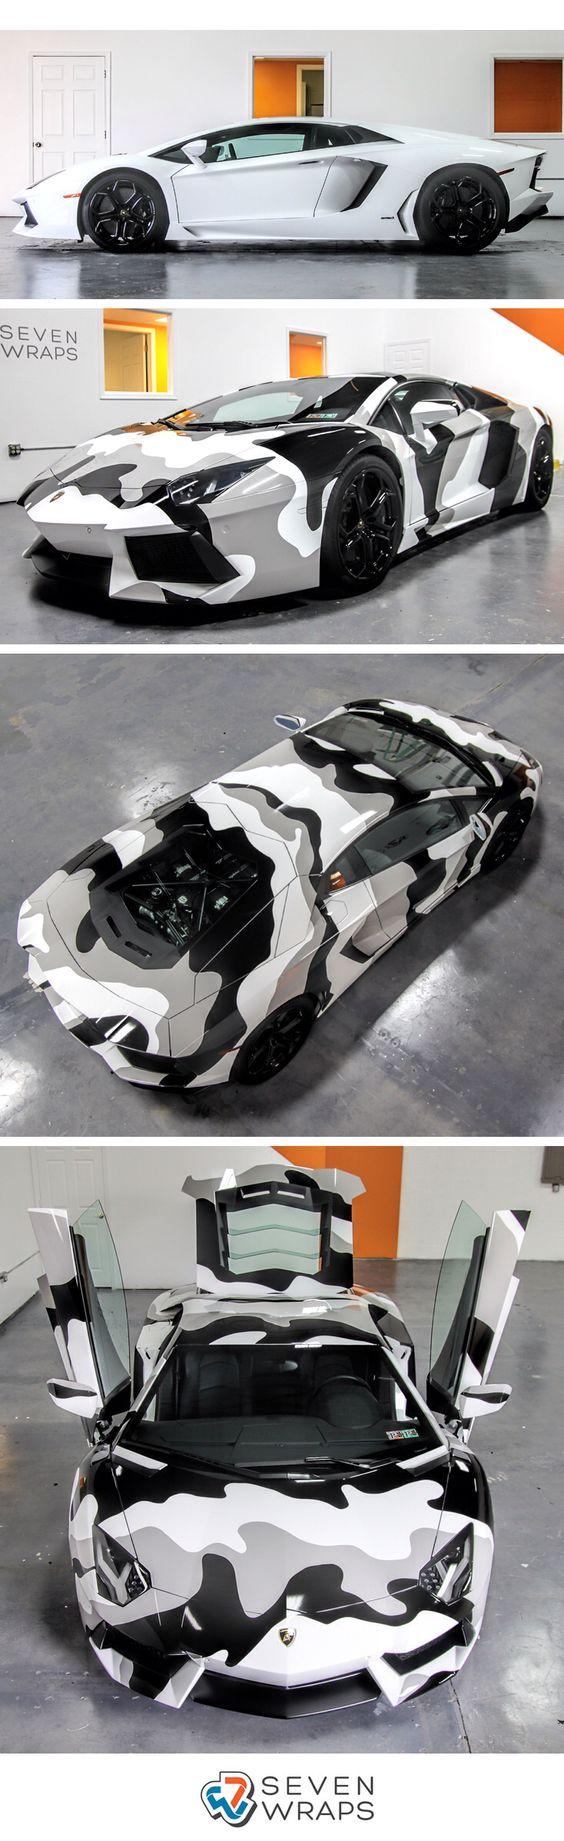 Lamborghini Aventador Camo Wrap By Seven Wraps Wrapped